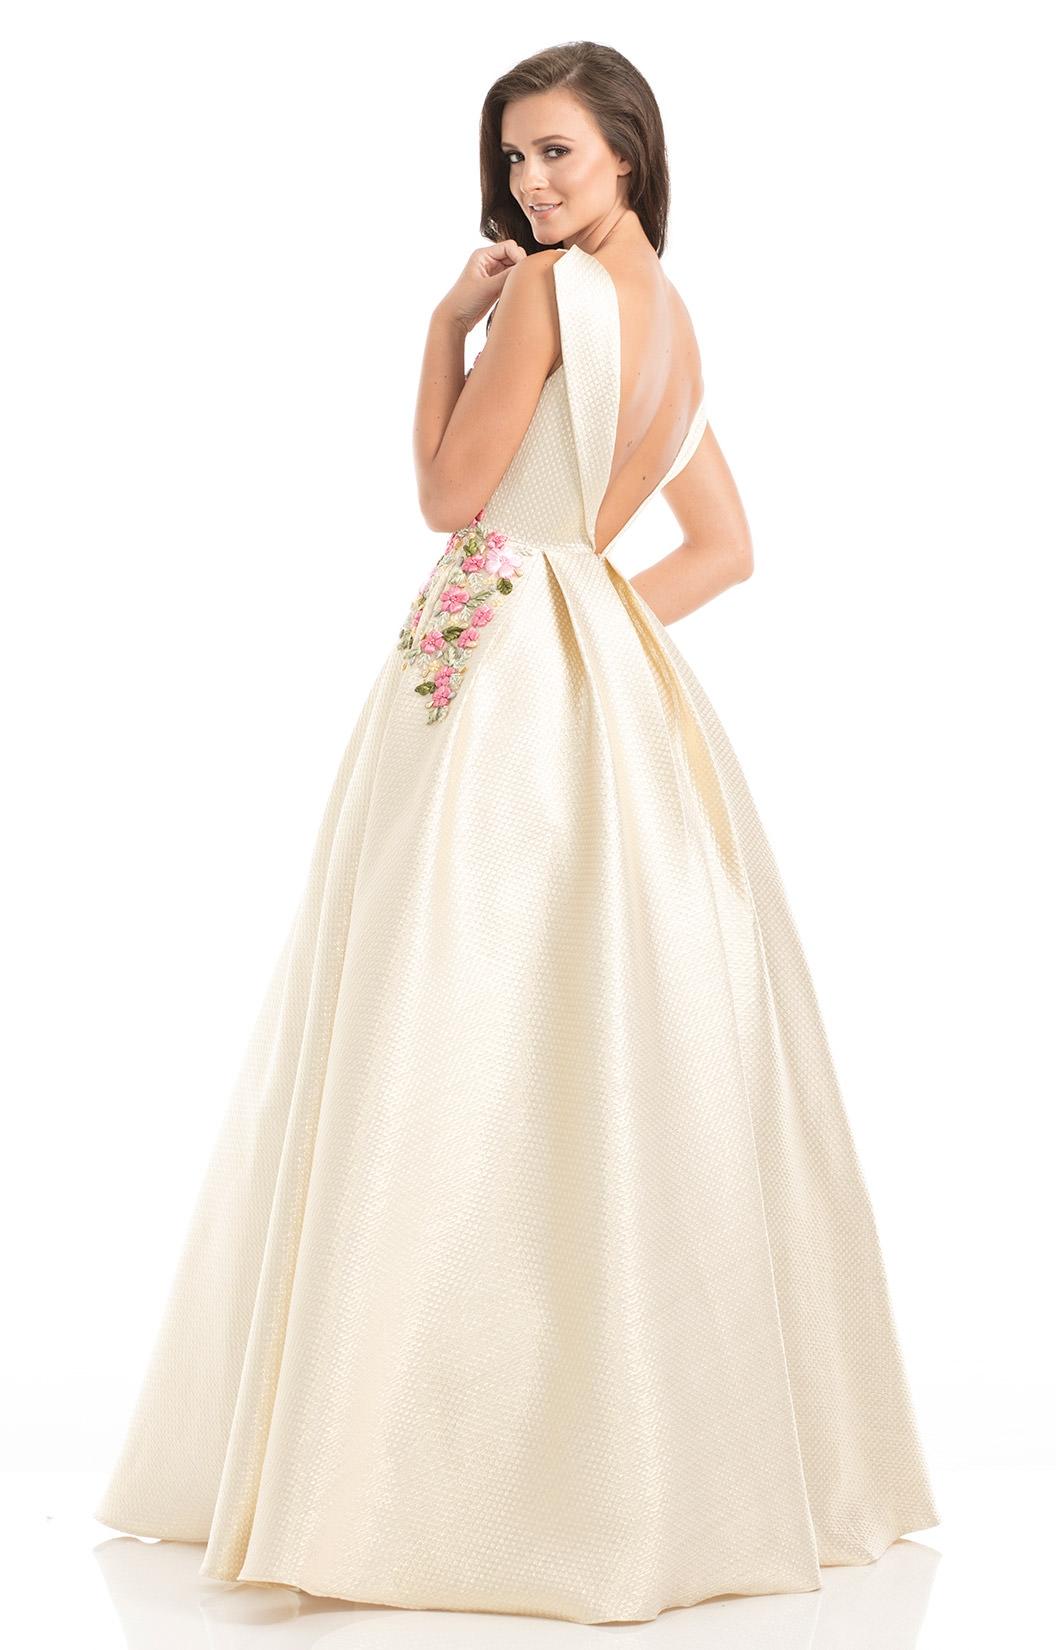 Johnathan Kayne 7030 Ribbon Lace Open Back Ballgown Prom